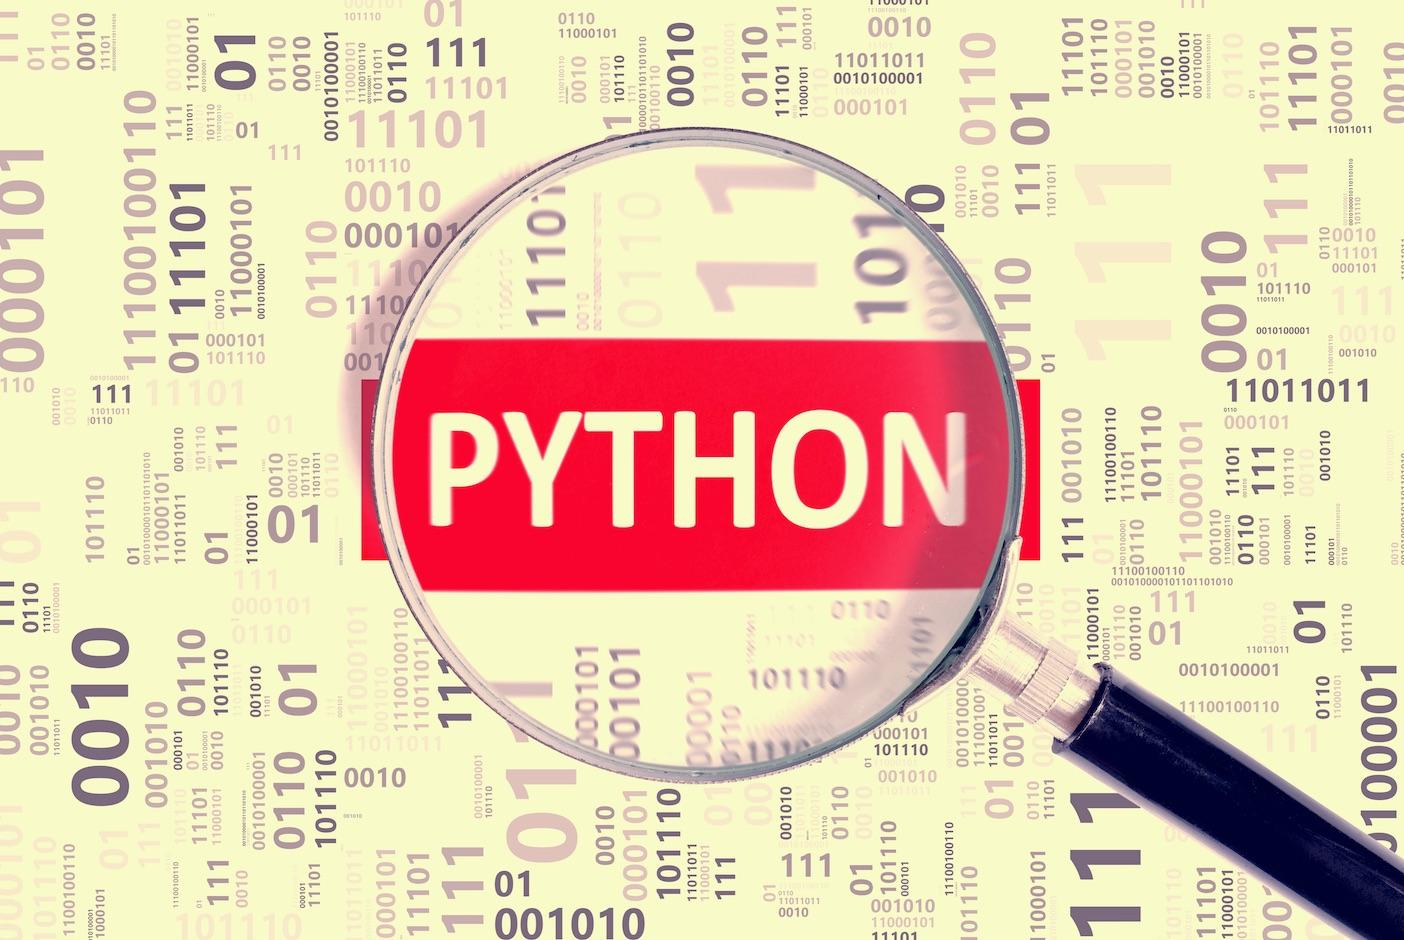 Pythonでclassをどう使う?技術顧問に聞いてみた!